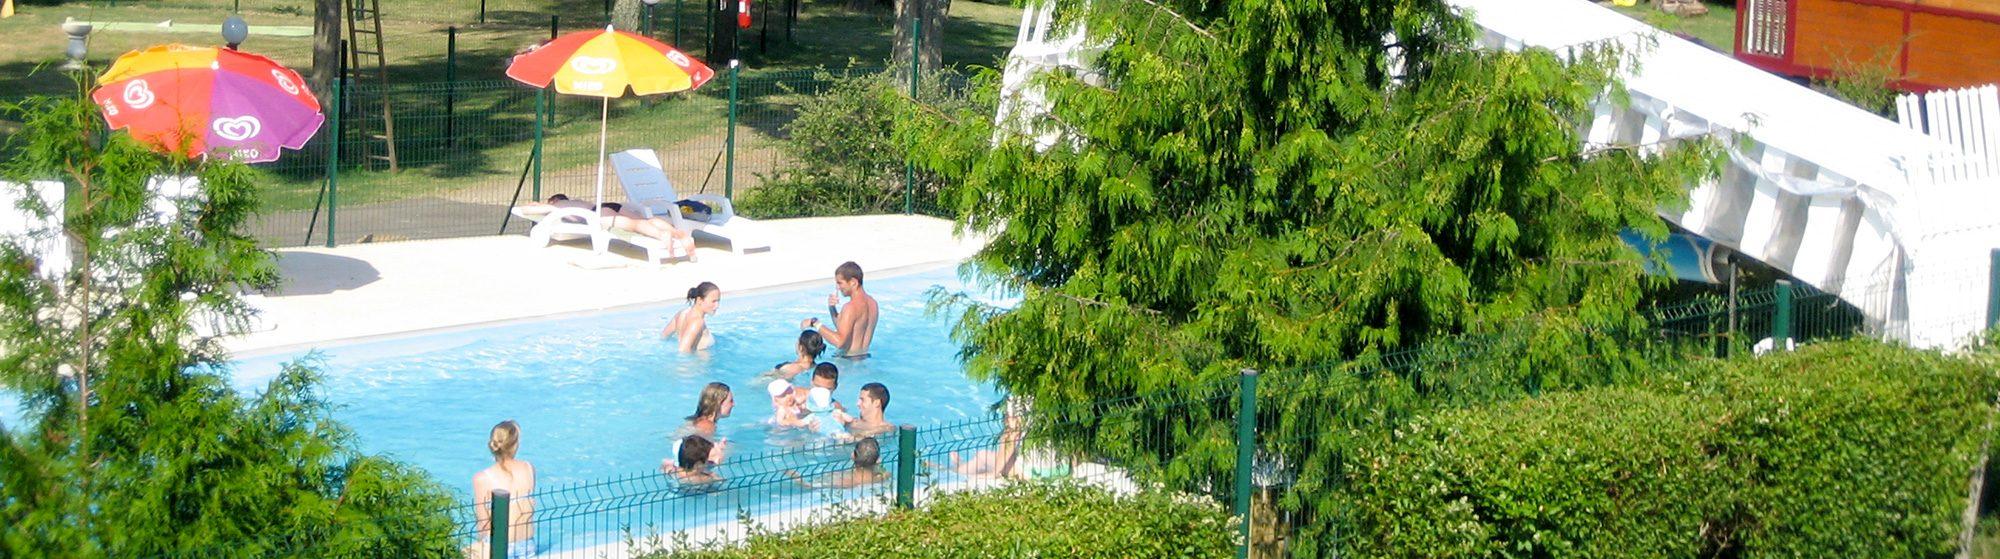 Campingplatz Loiret Mit Pool | Campingplatz Von Gien ... tout Piscine De Gien